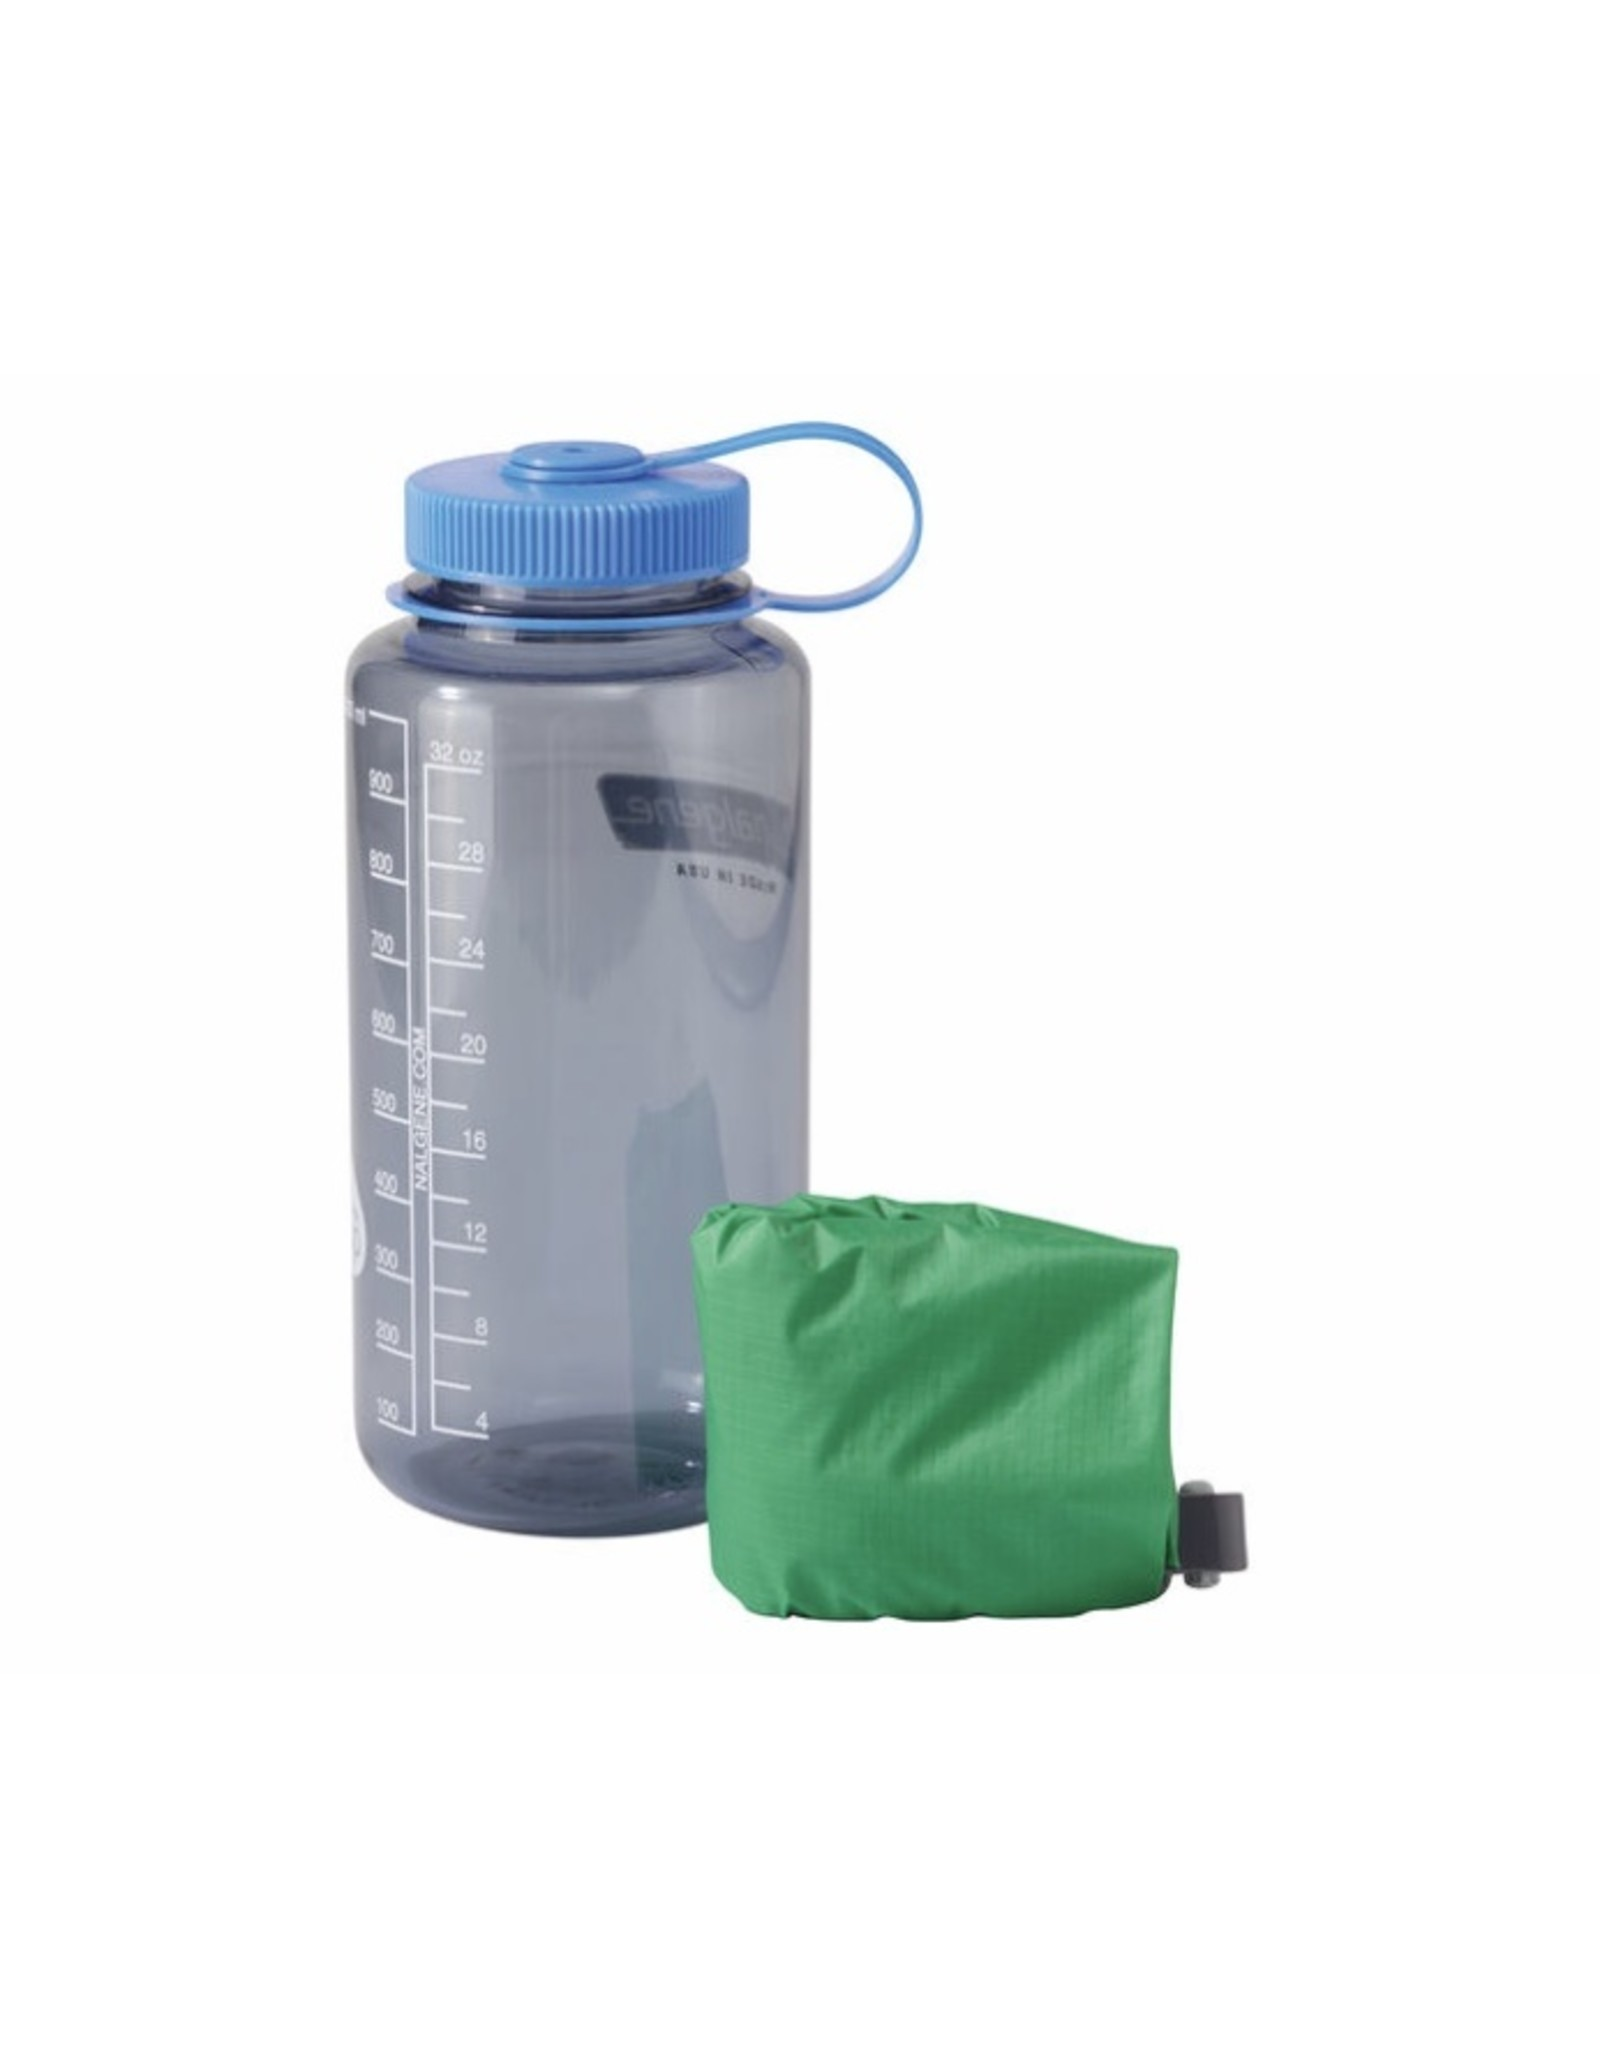 Therm-a-Rest Therm-a-Rest BlockerLite Pump Sack